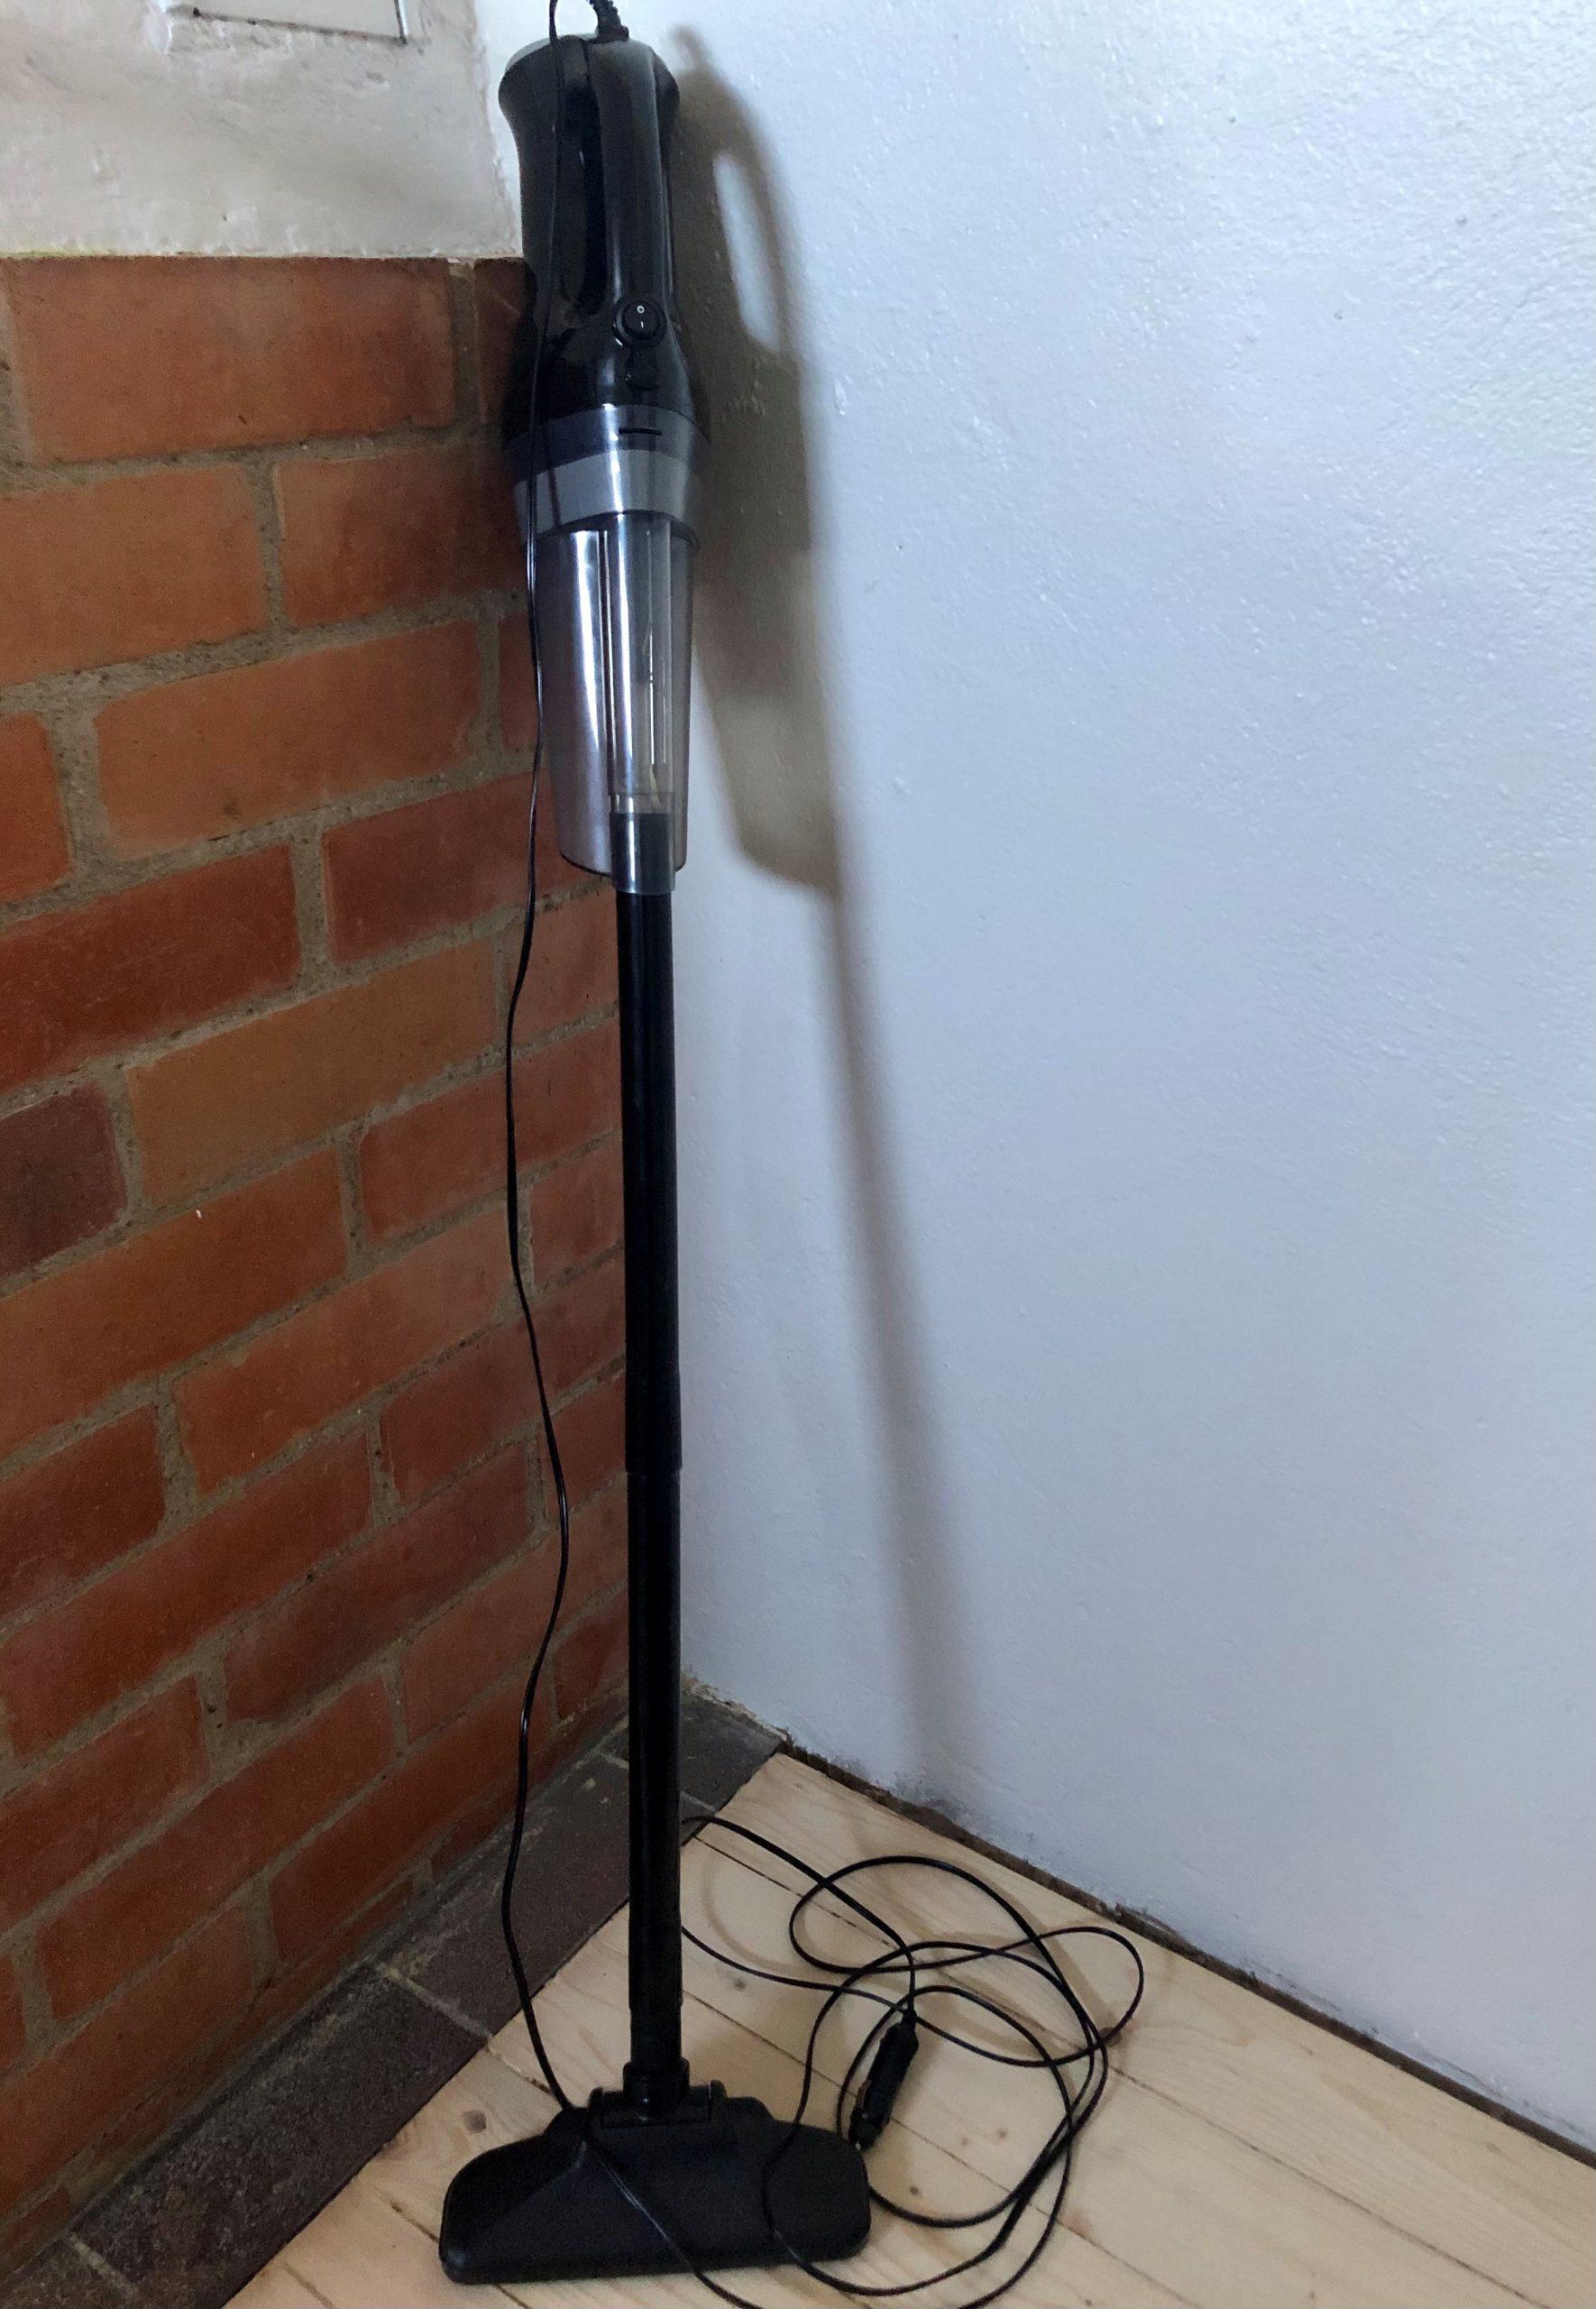 Dammsugare 12 volt från Seasea